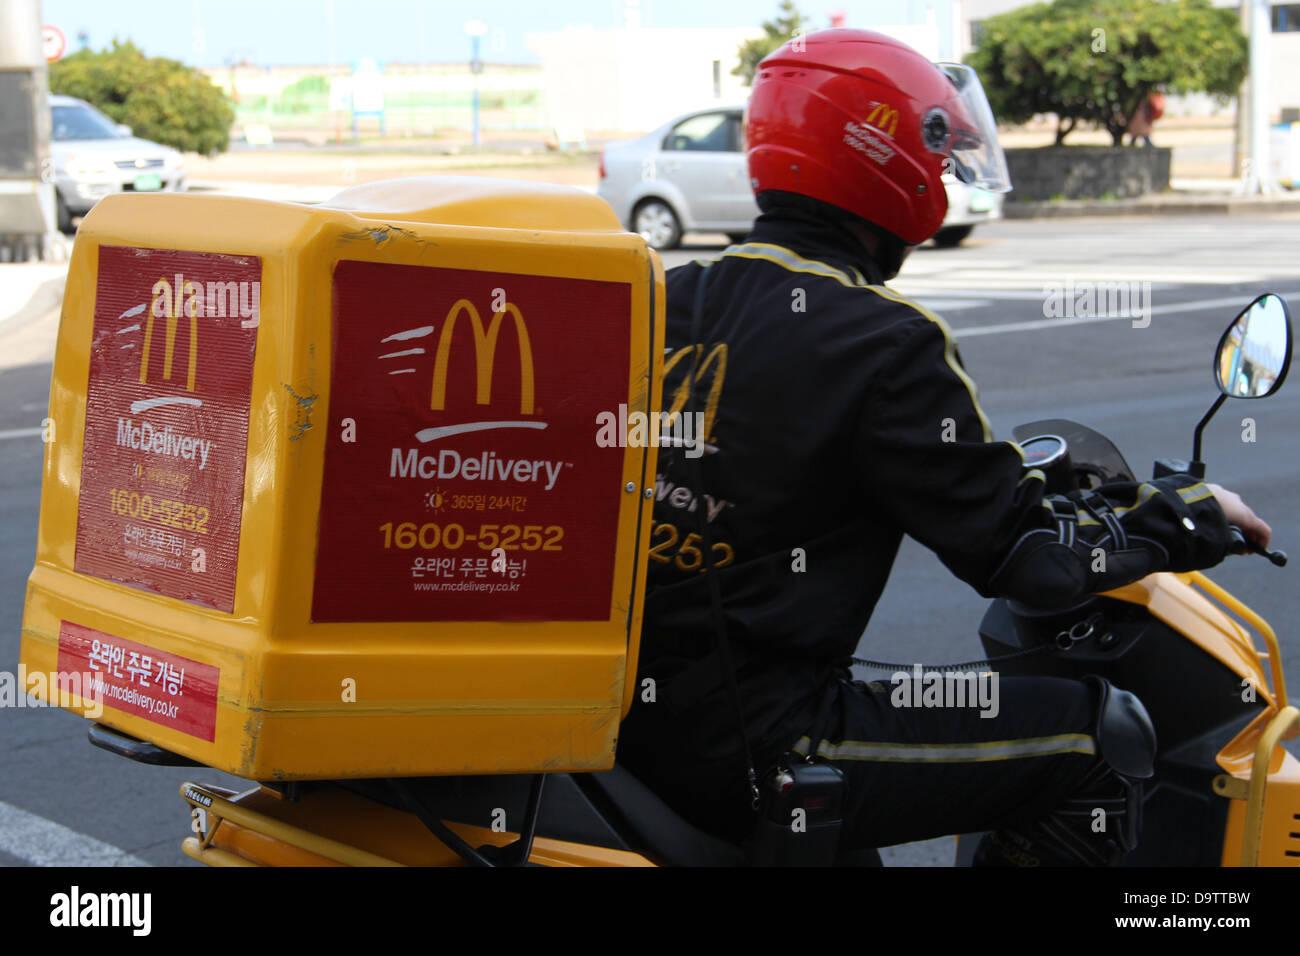 South Korea: McDonald's delivery service on Jeju island